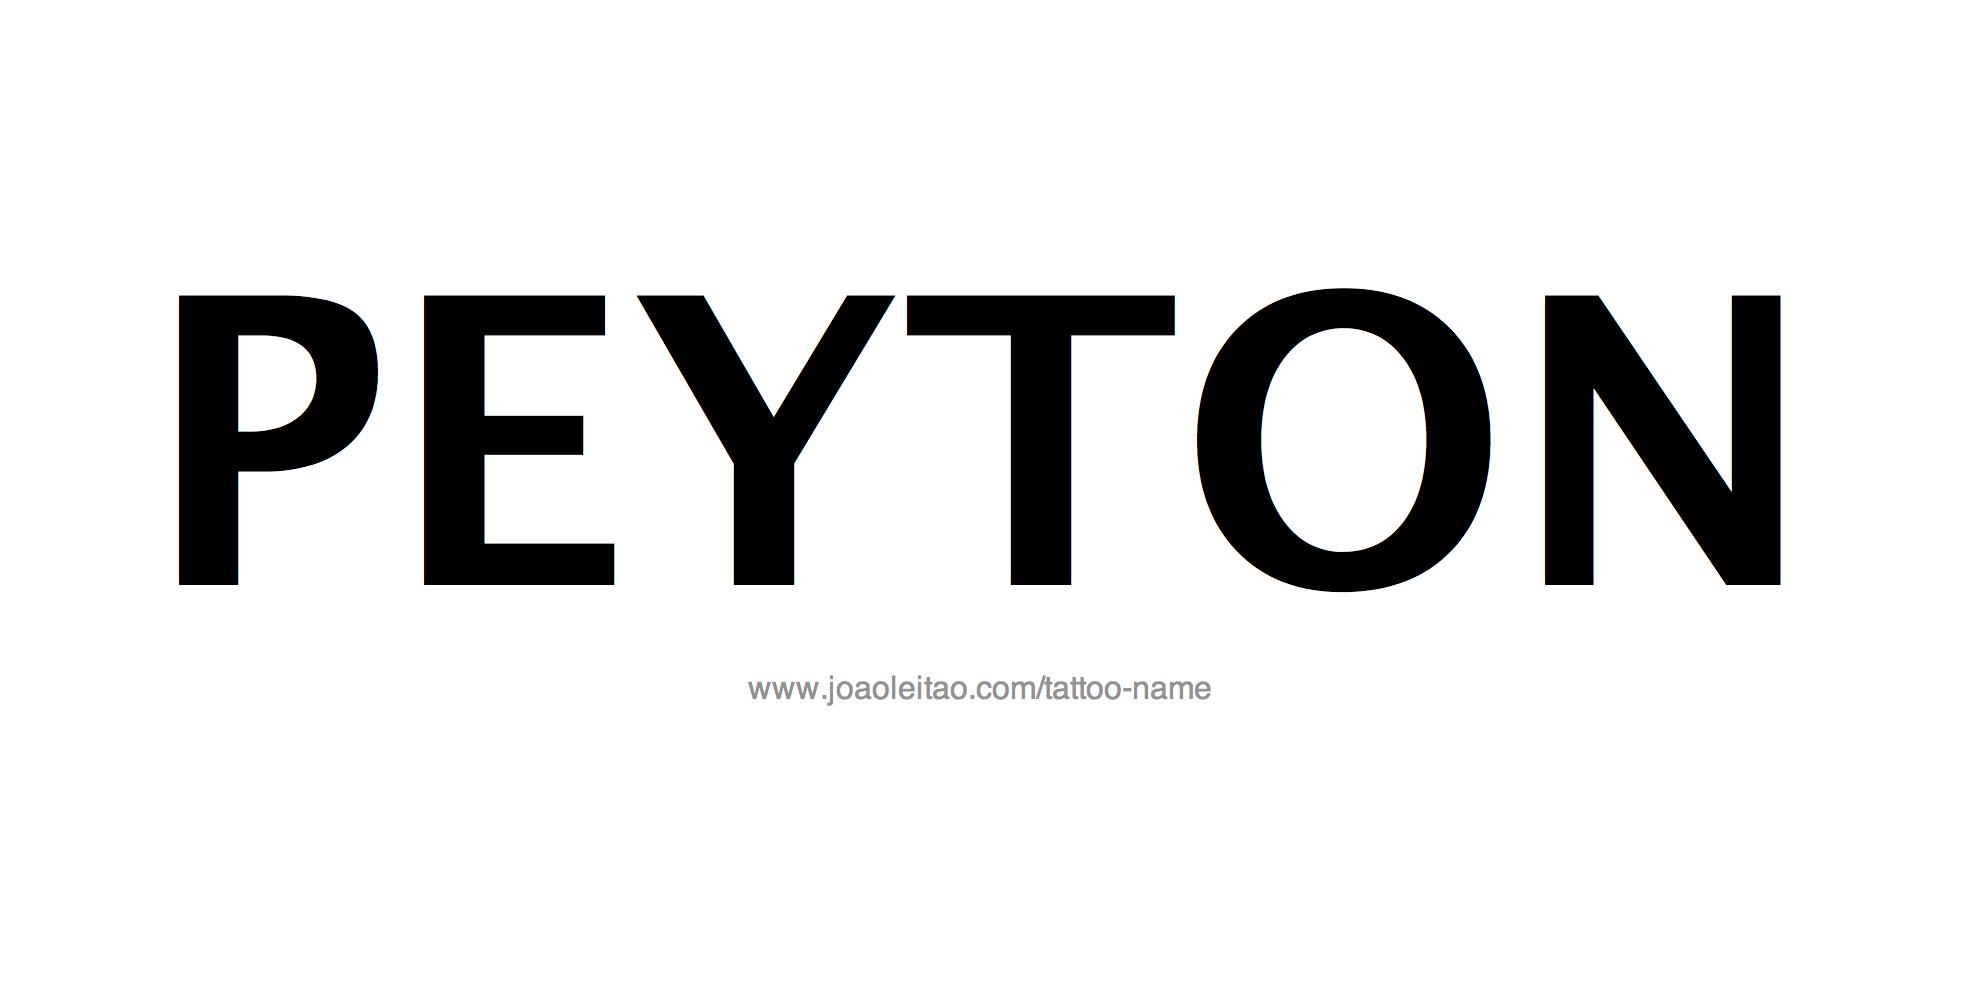 Name: Peyton Name Tattoo Designs